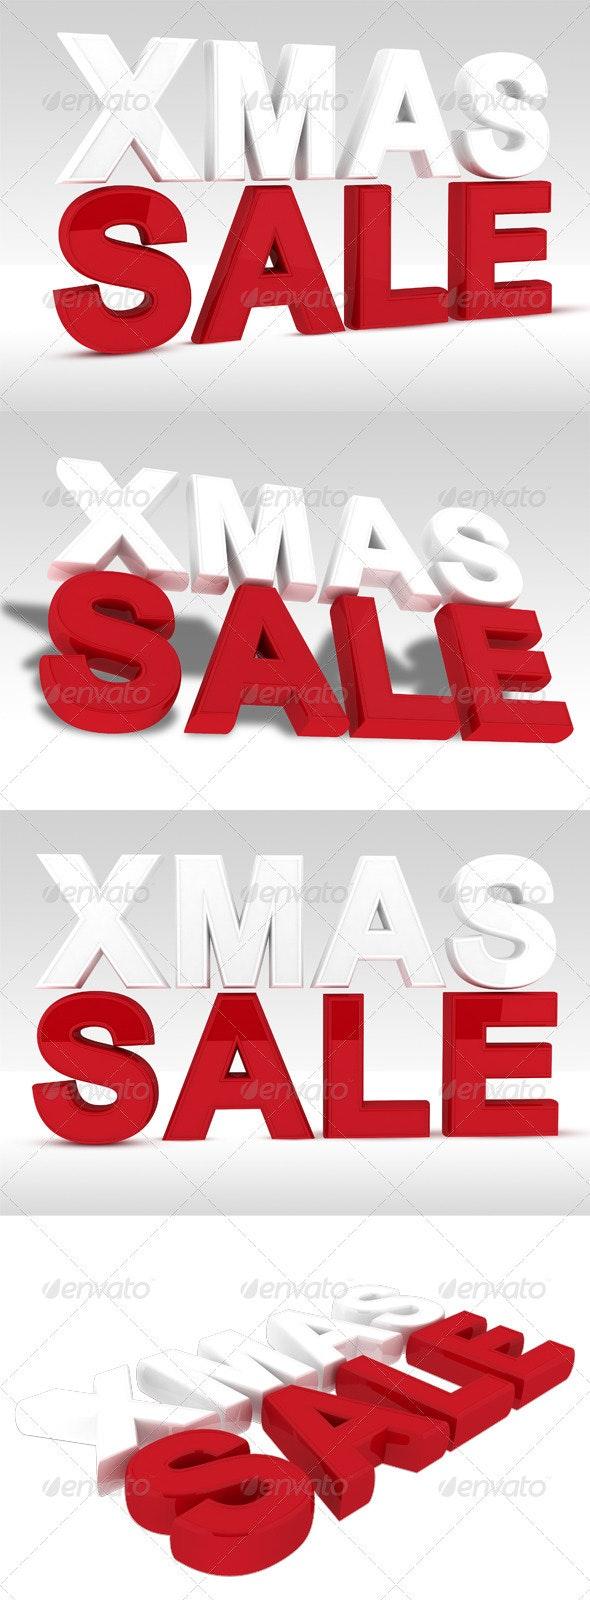 Christmas Sale - Xmas Sale - 3D Renders Graphics